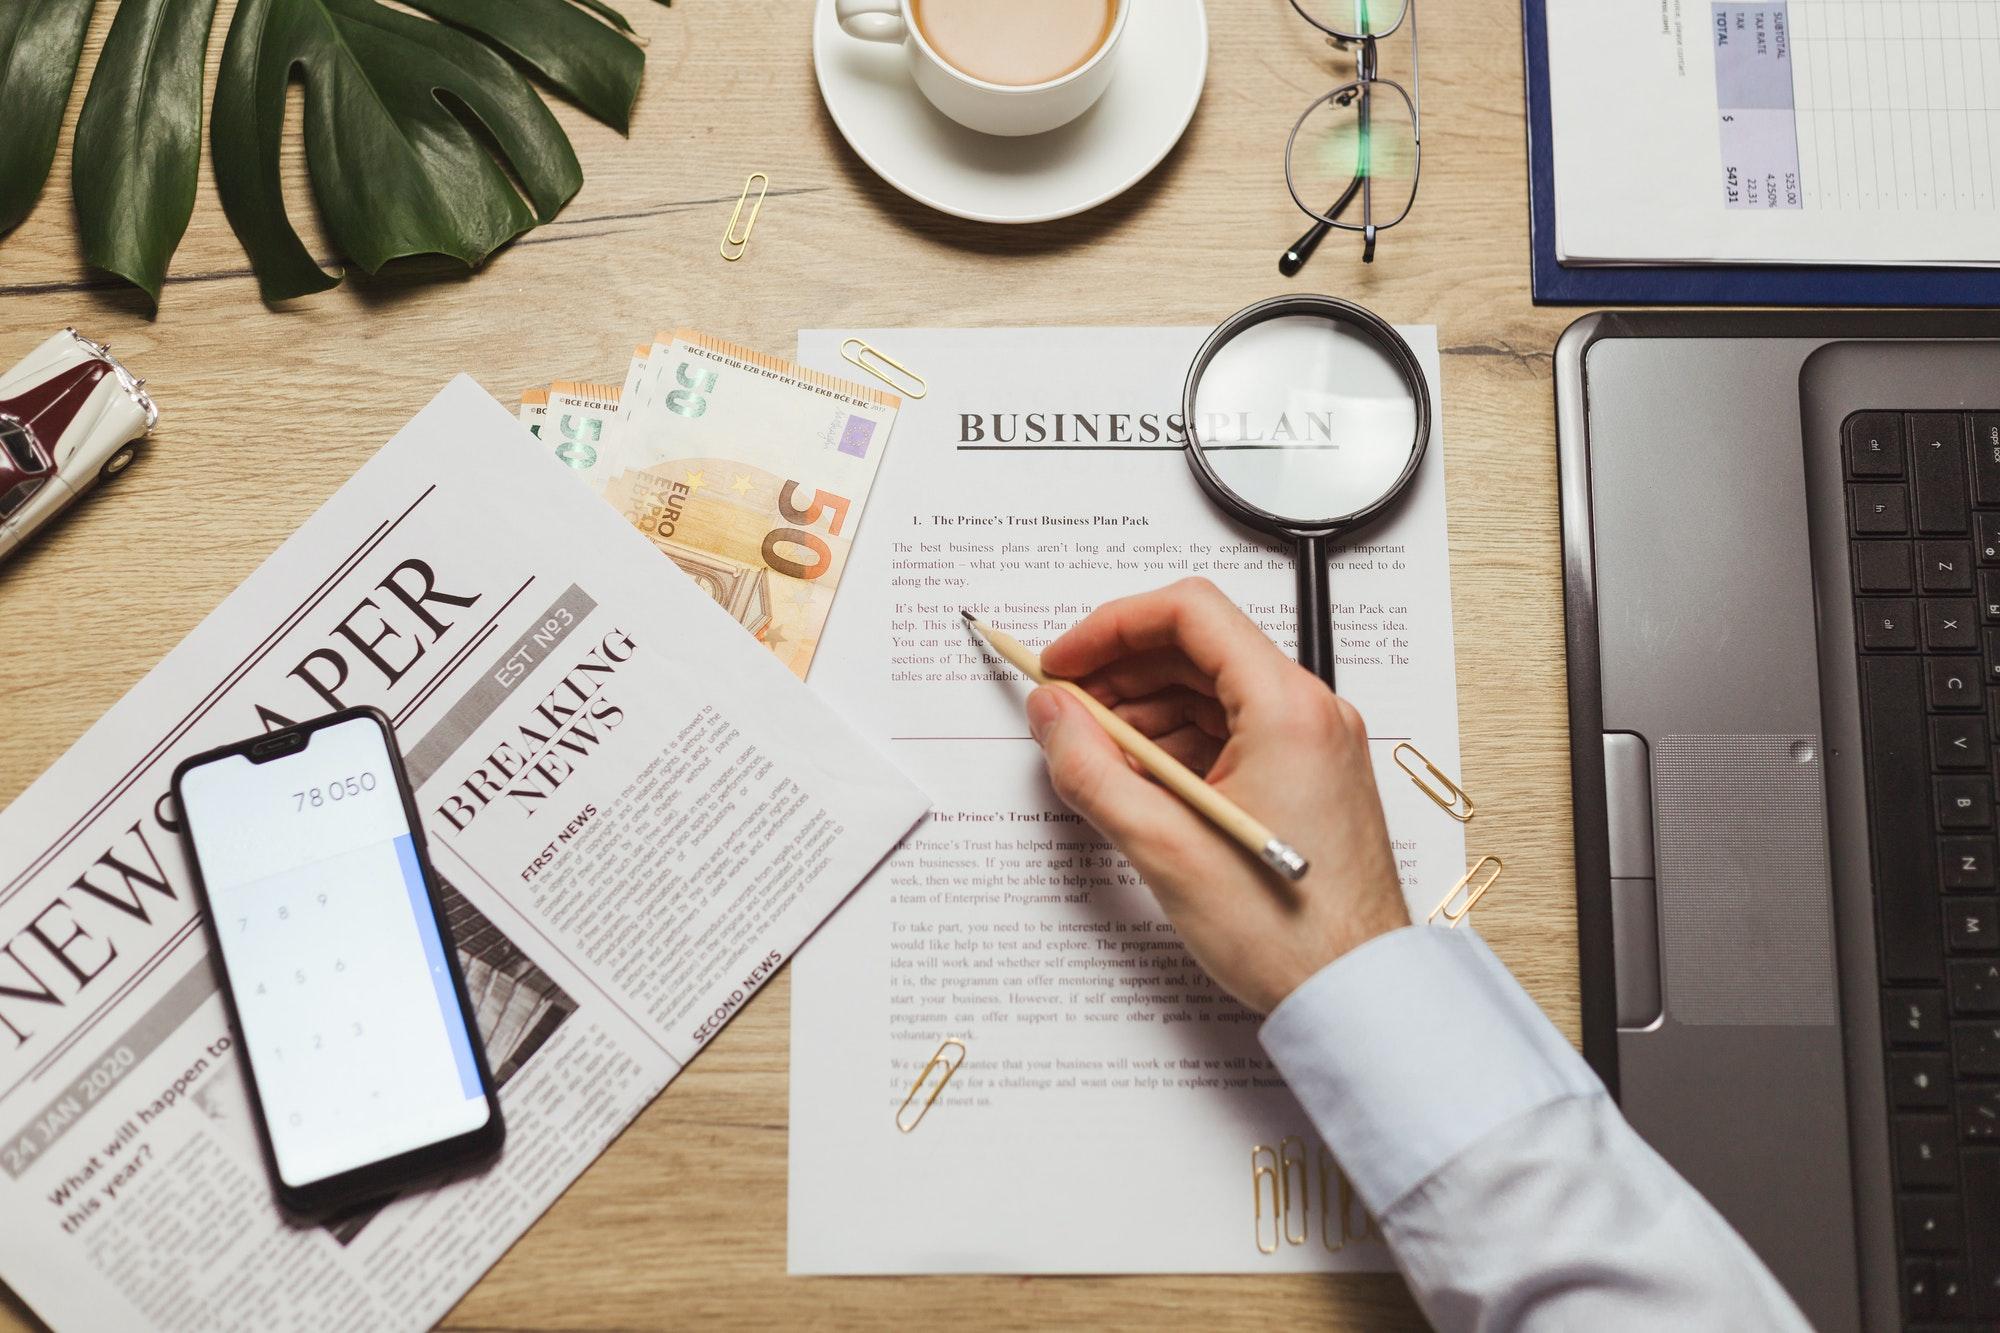 businessman hand checking marketing document business plan